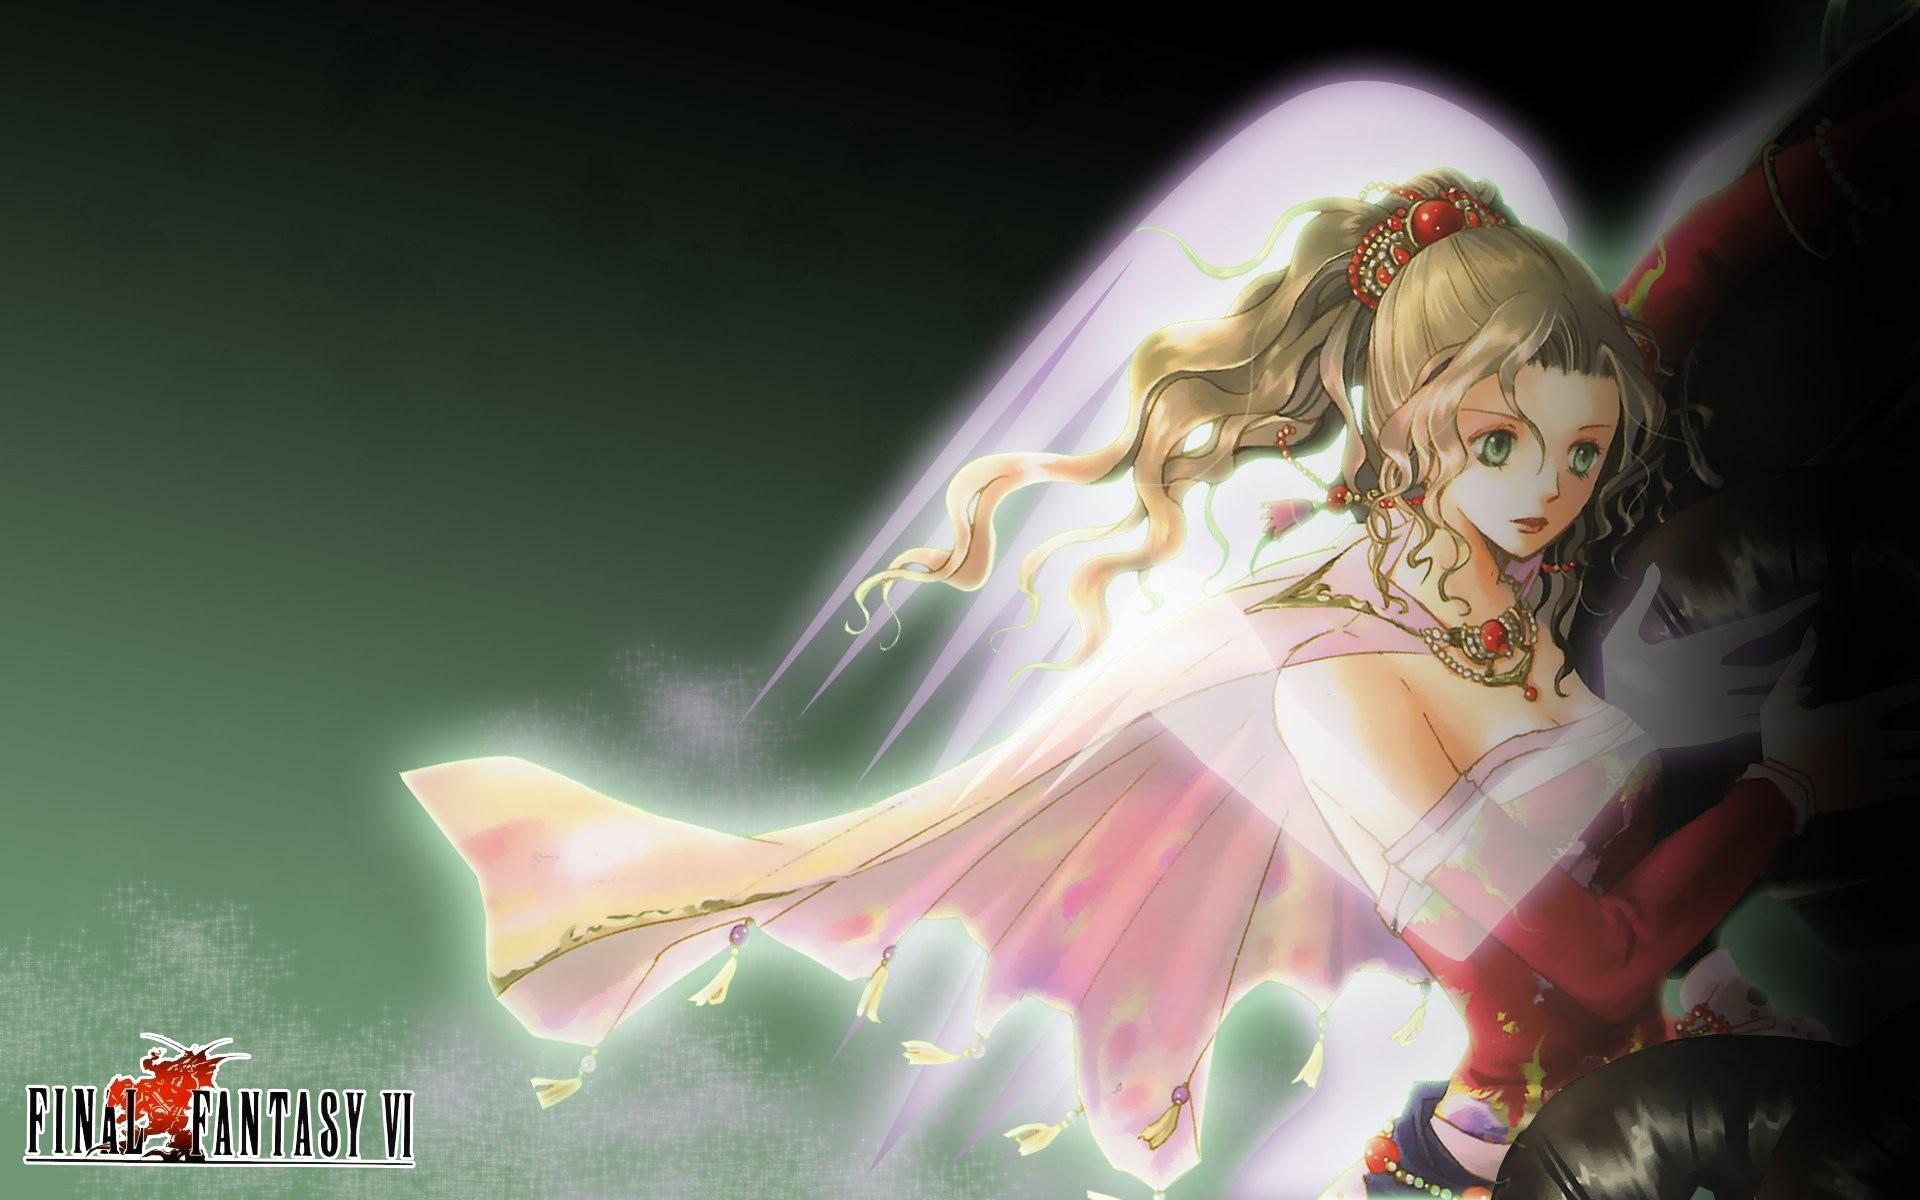 Square Enix Terra Final Fantasy VI wallpaper     262150    WallpaperUP